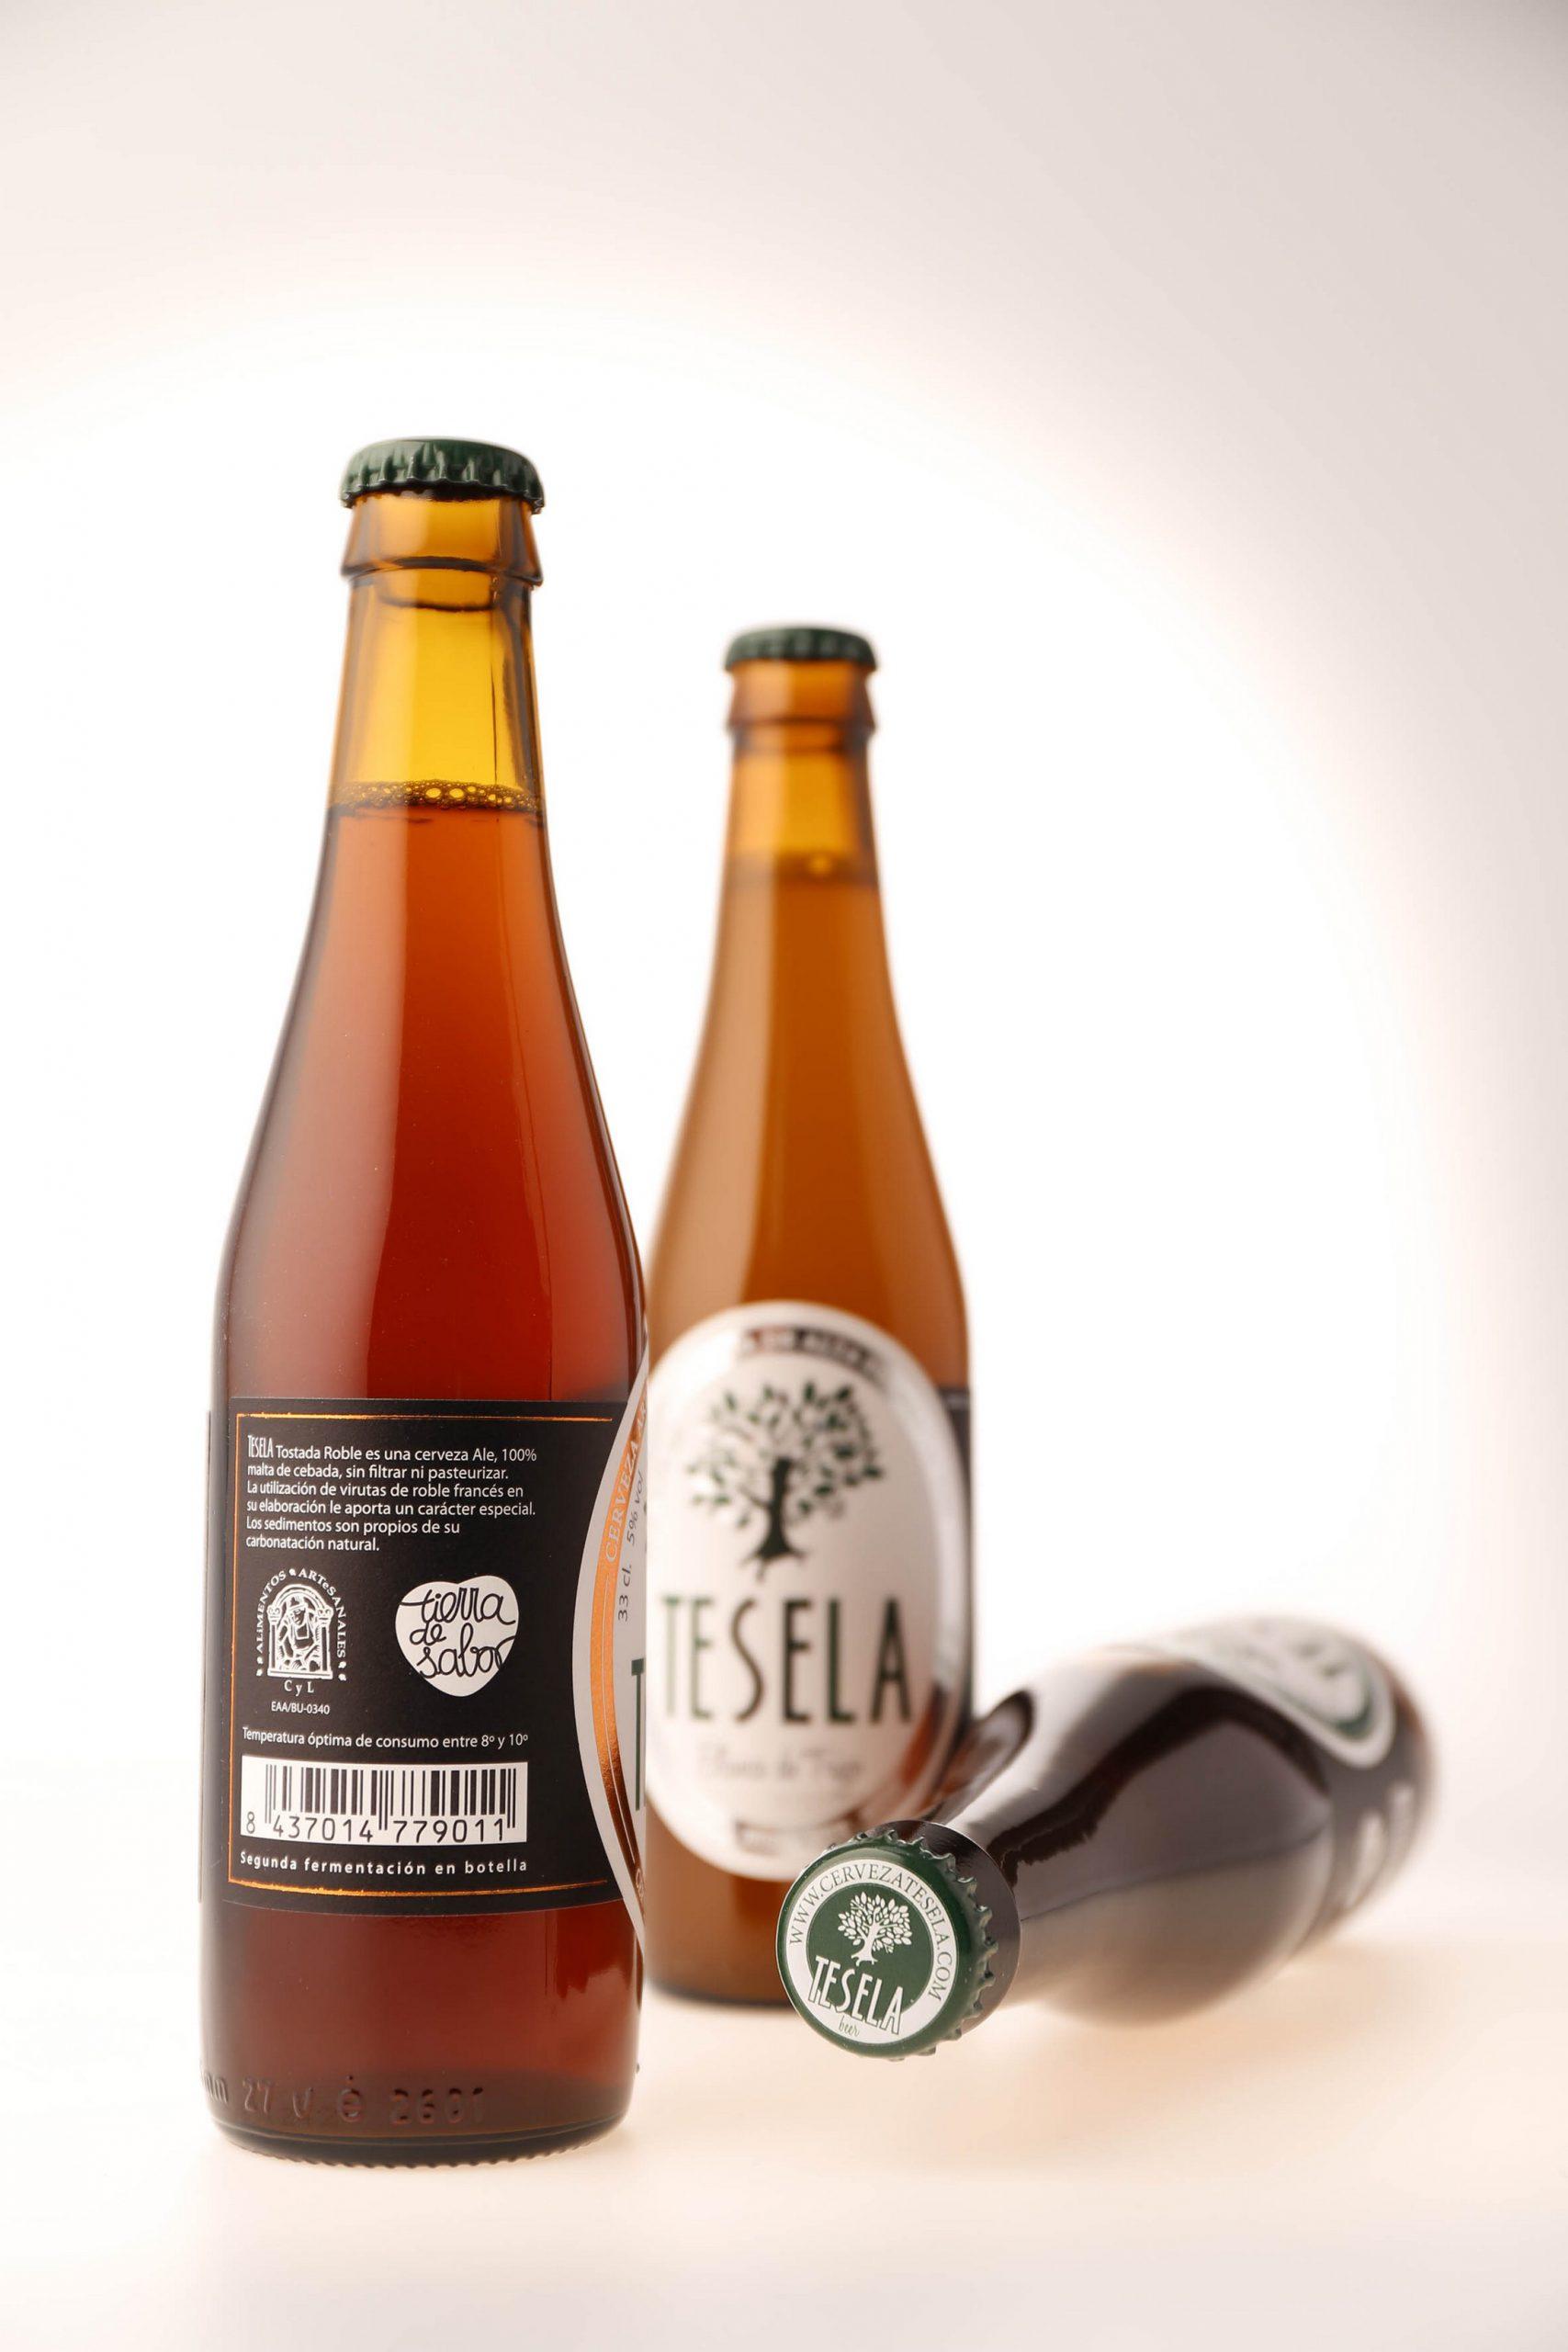 Tesela, la cerveza artesana